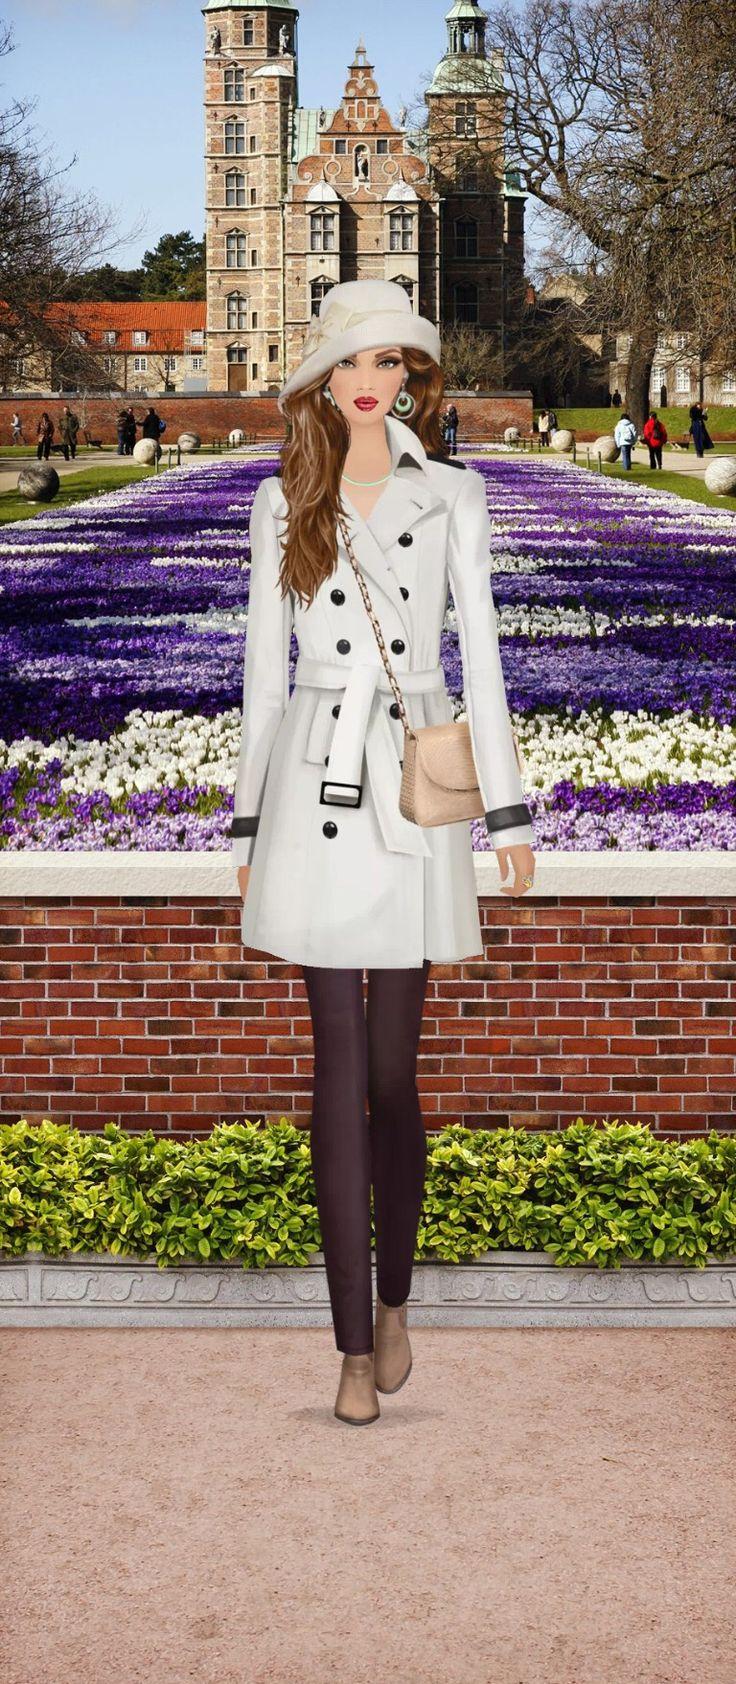 20 Best Covet Fashion Jet Set High Scores Images On Pinterest Covet Fashion Jet Set And Scores